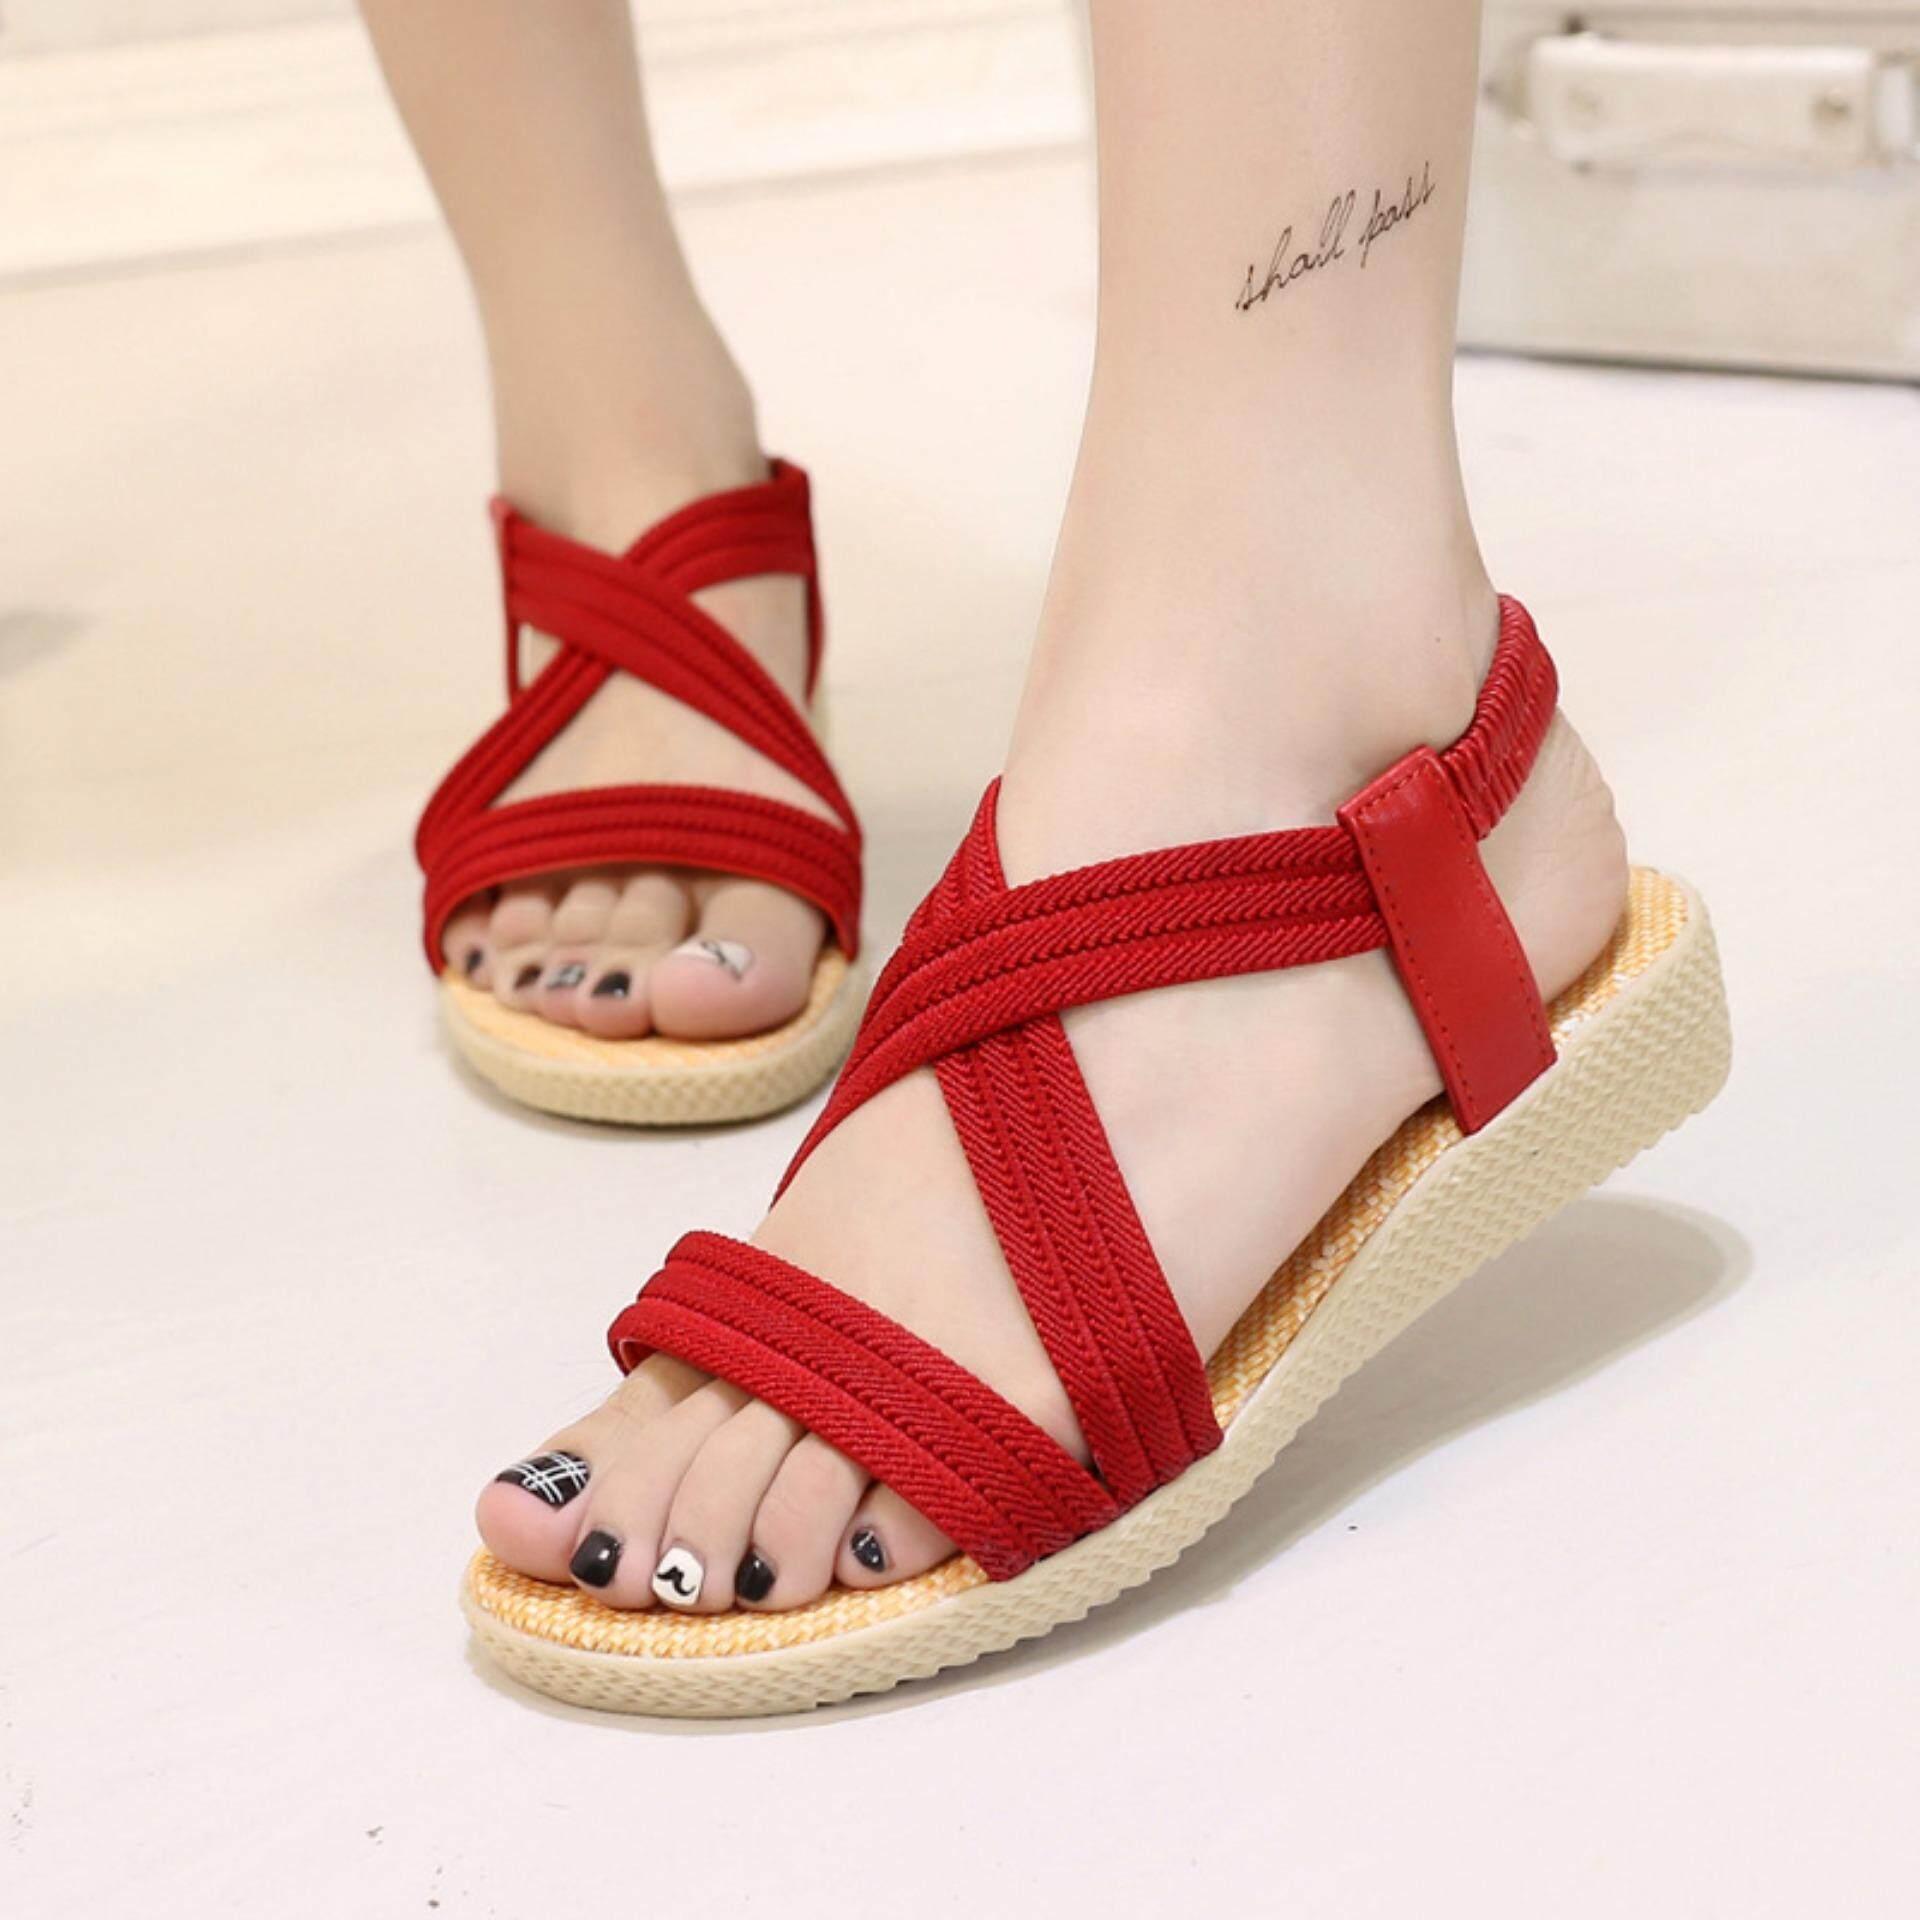 f3cb893ed8f516 Women Summer Flat Sandals Shoes Open Toe Beach Flip Flops Slipper Sandal-red  - intl